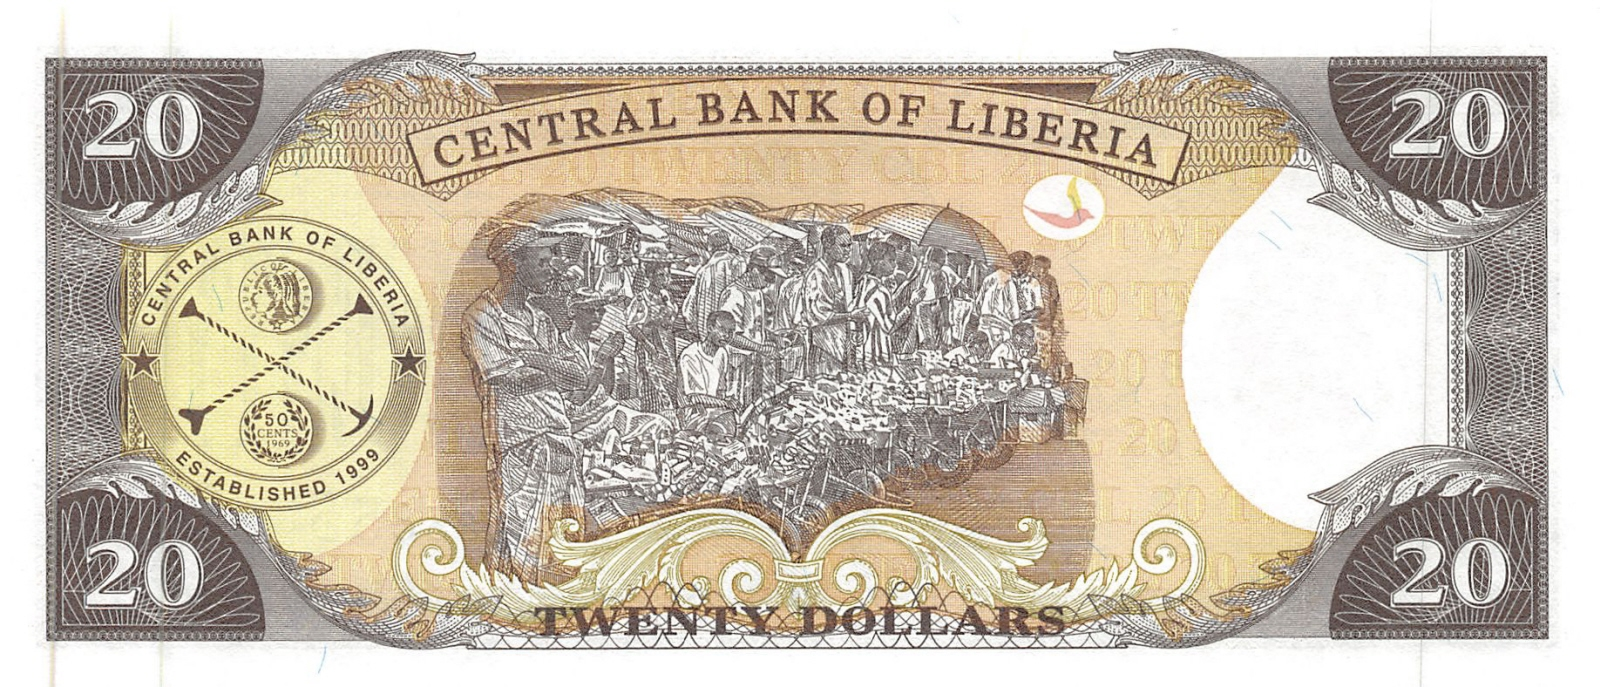 2003 20 dollars P-28a Liberia // Africa UNC